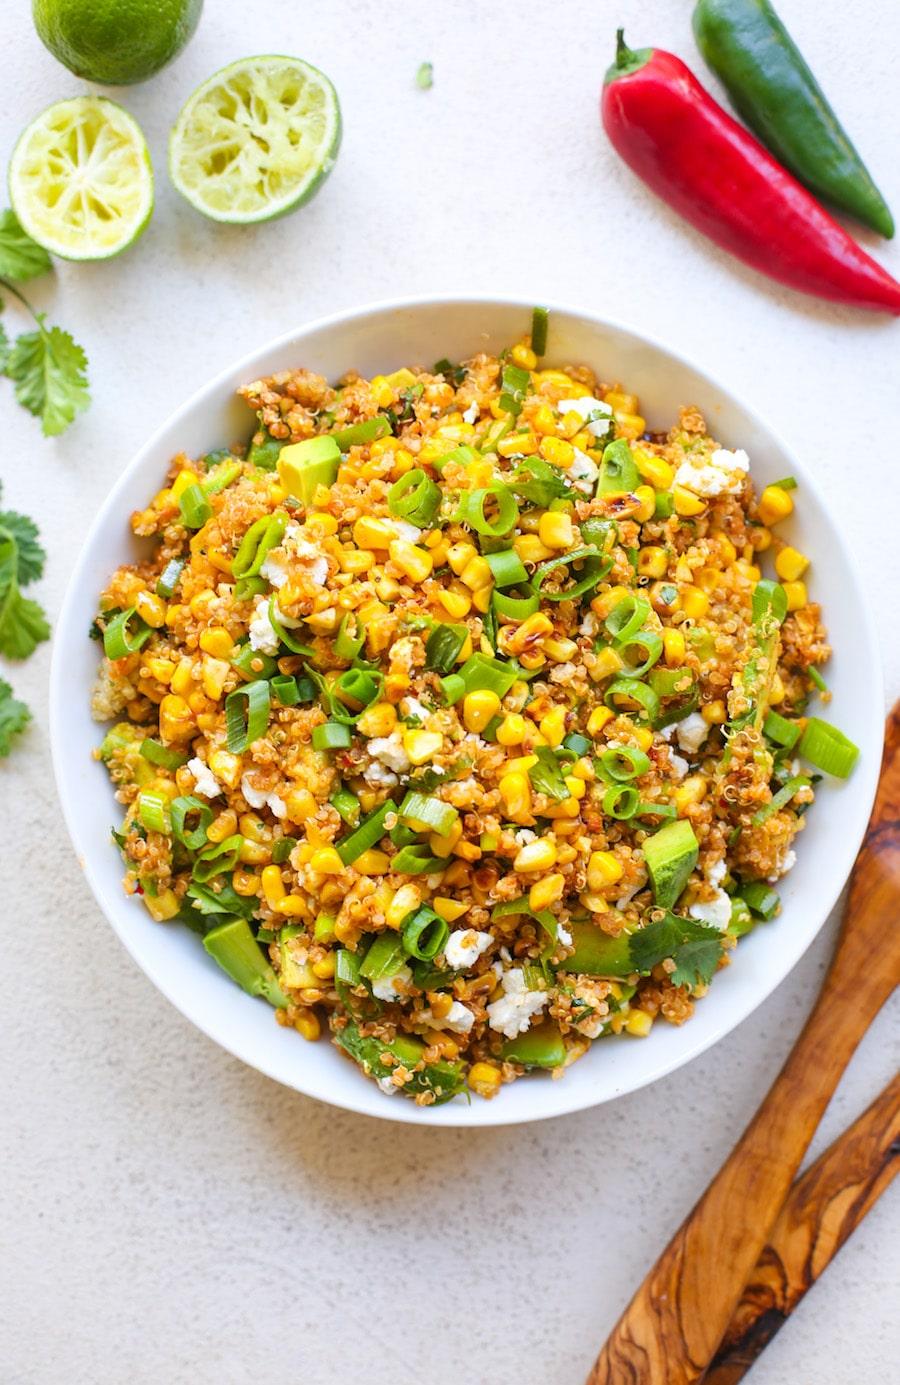 Southwest Avocado Quinoa Corn Salad - the perfect summer salad to bring to BBQ's & potlucks   Gluten Free + Vegetarian